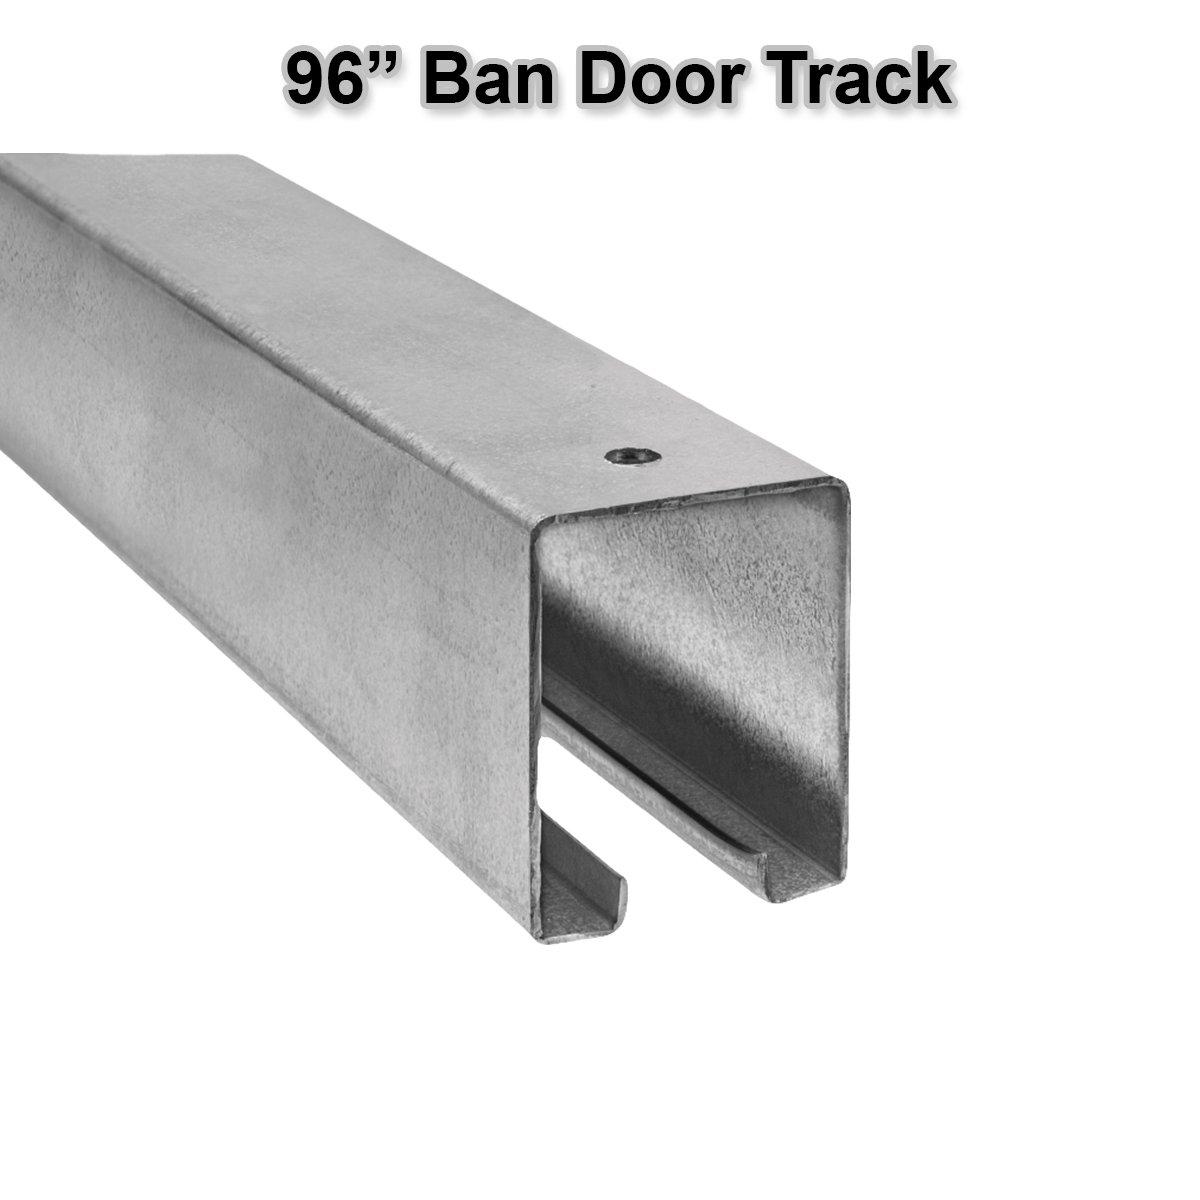 96'' Rail Track Barn Door Hanging Overhead Galvanized Steel Sliding Trolley